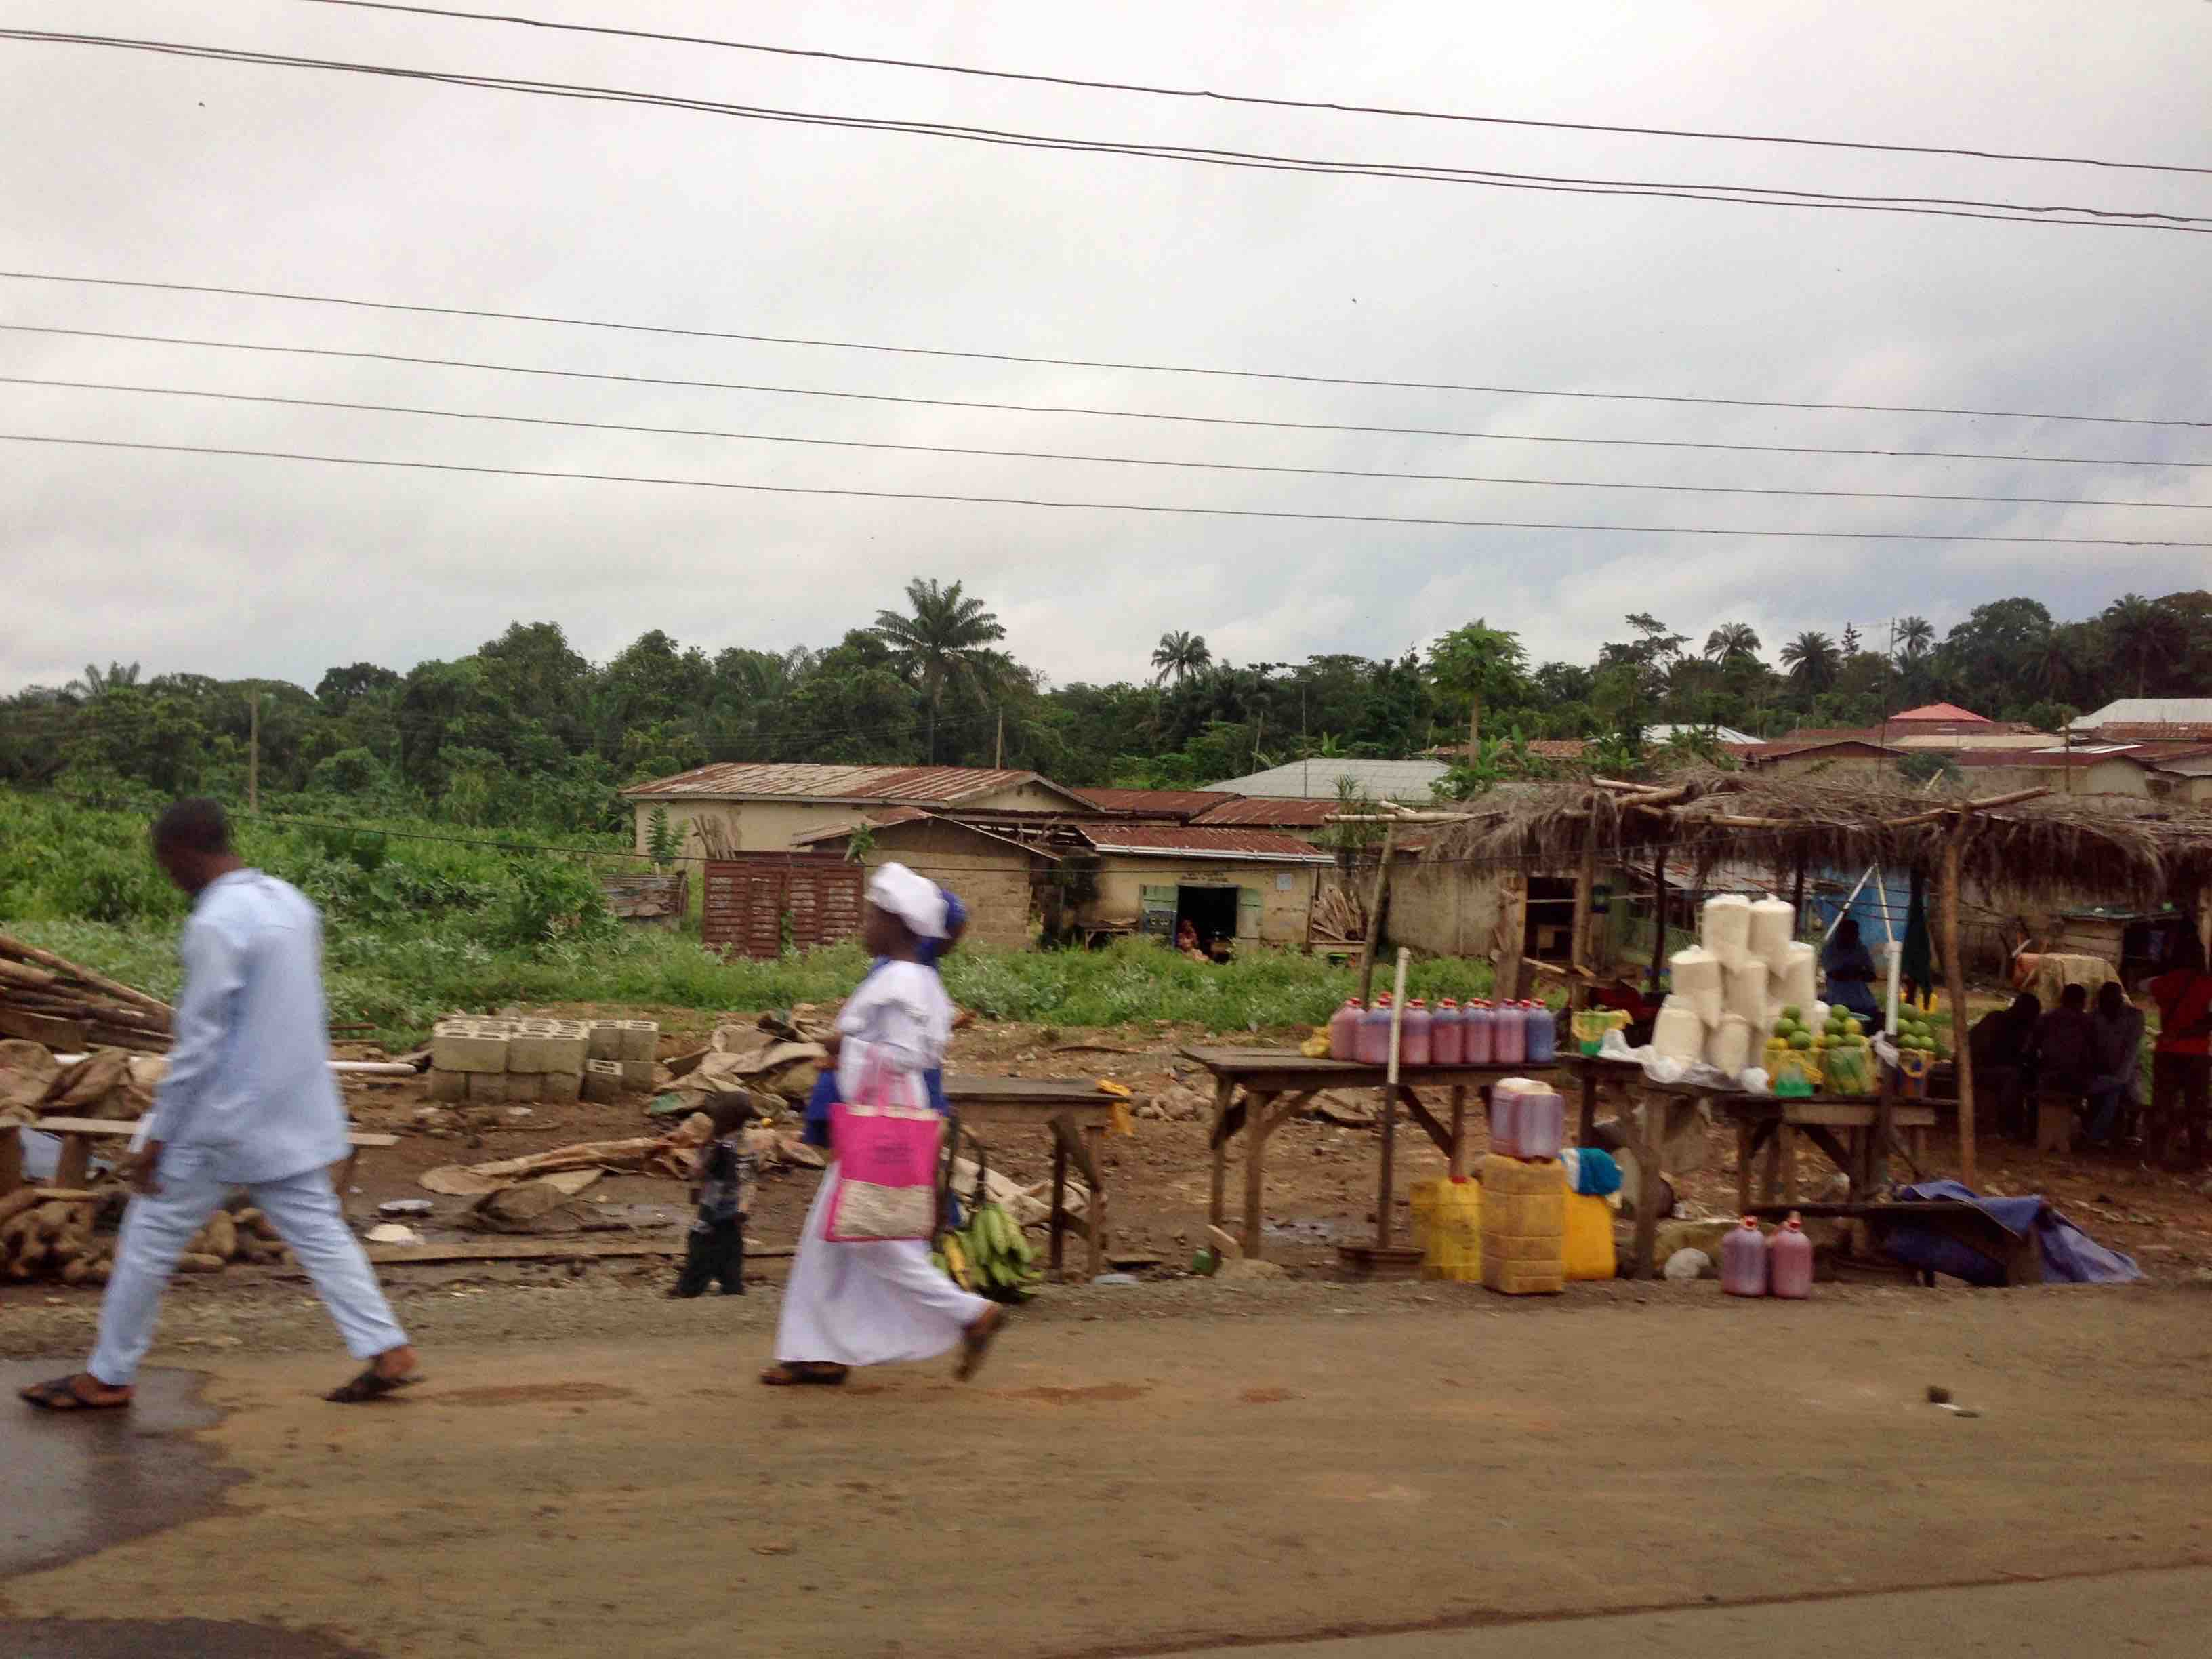 Roadside market in Igbara Oke, Ondo State, Nigeria. #JujuFilms